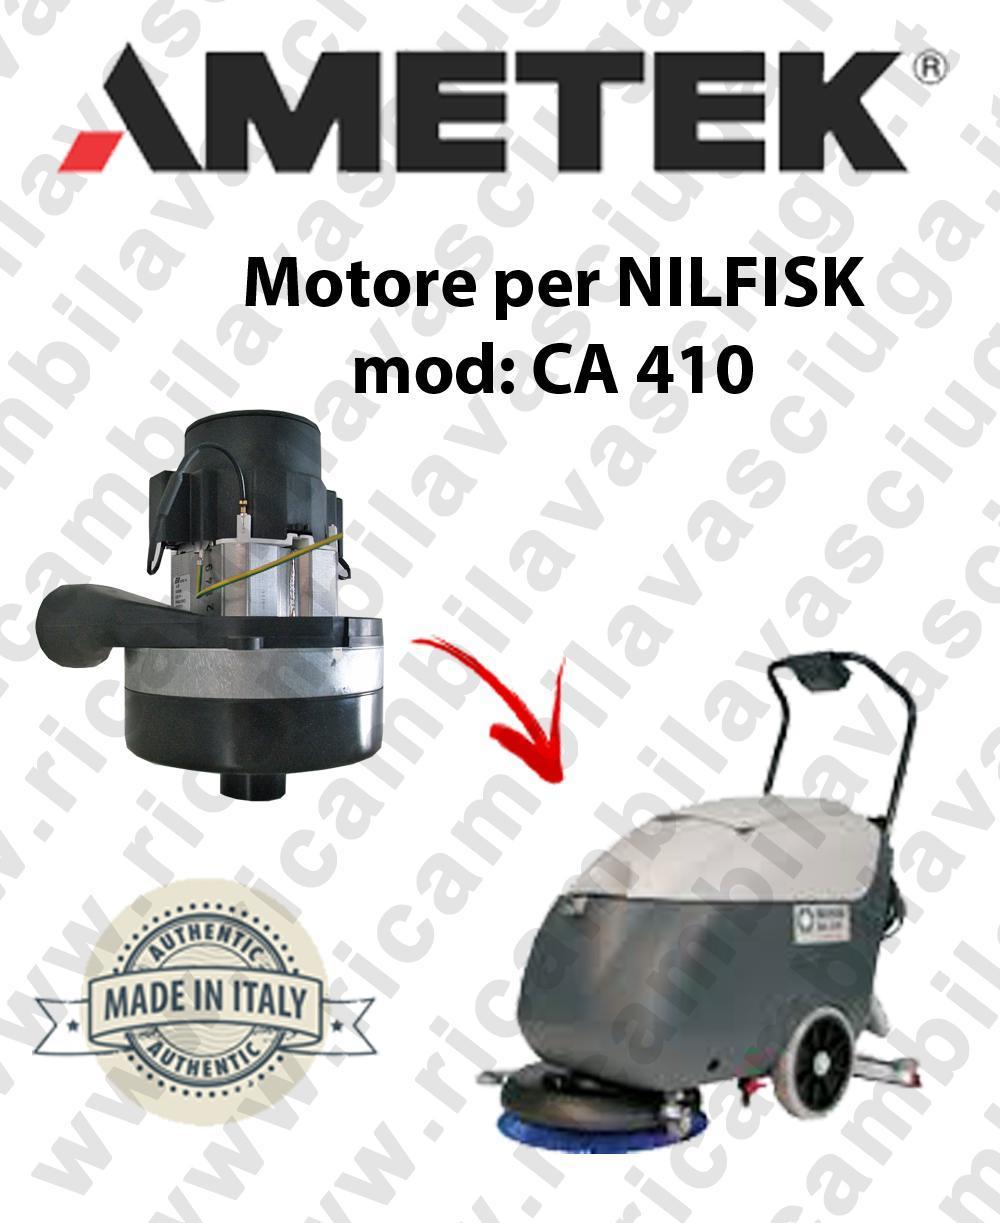 CA 410 Motore de aspiración AMETEK para fregadora NILFISK